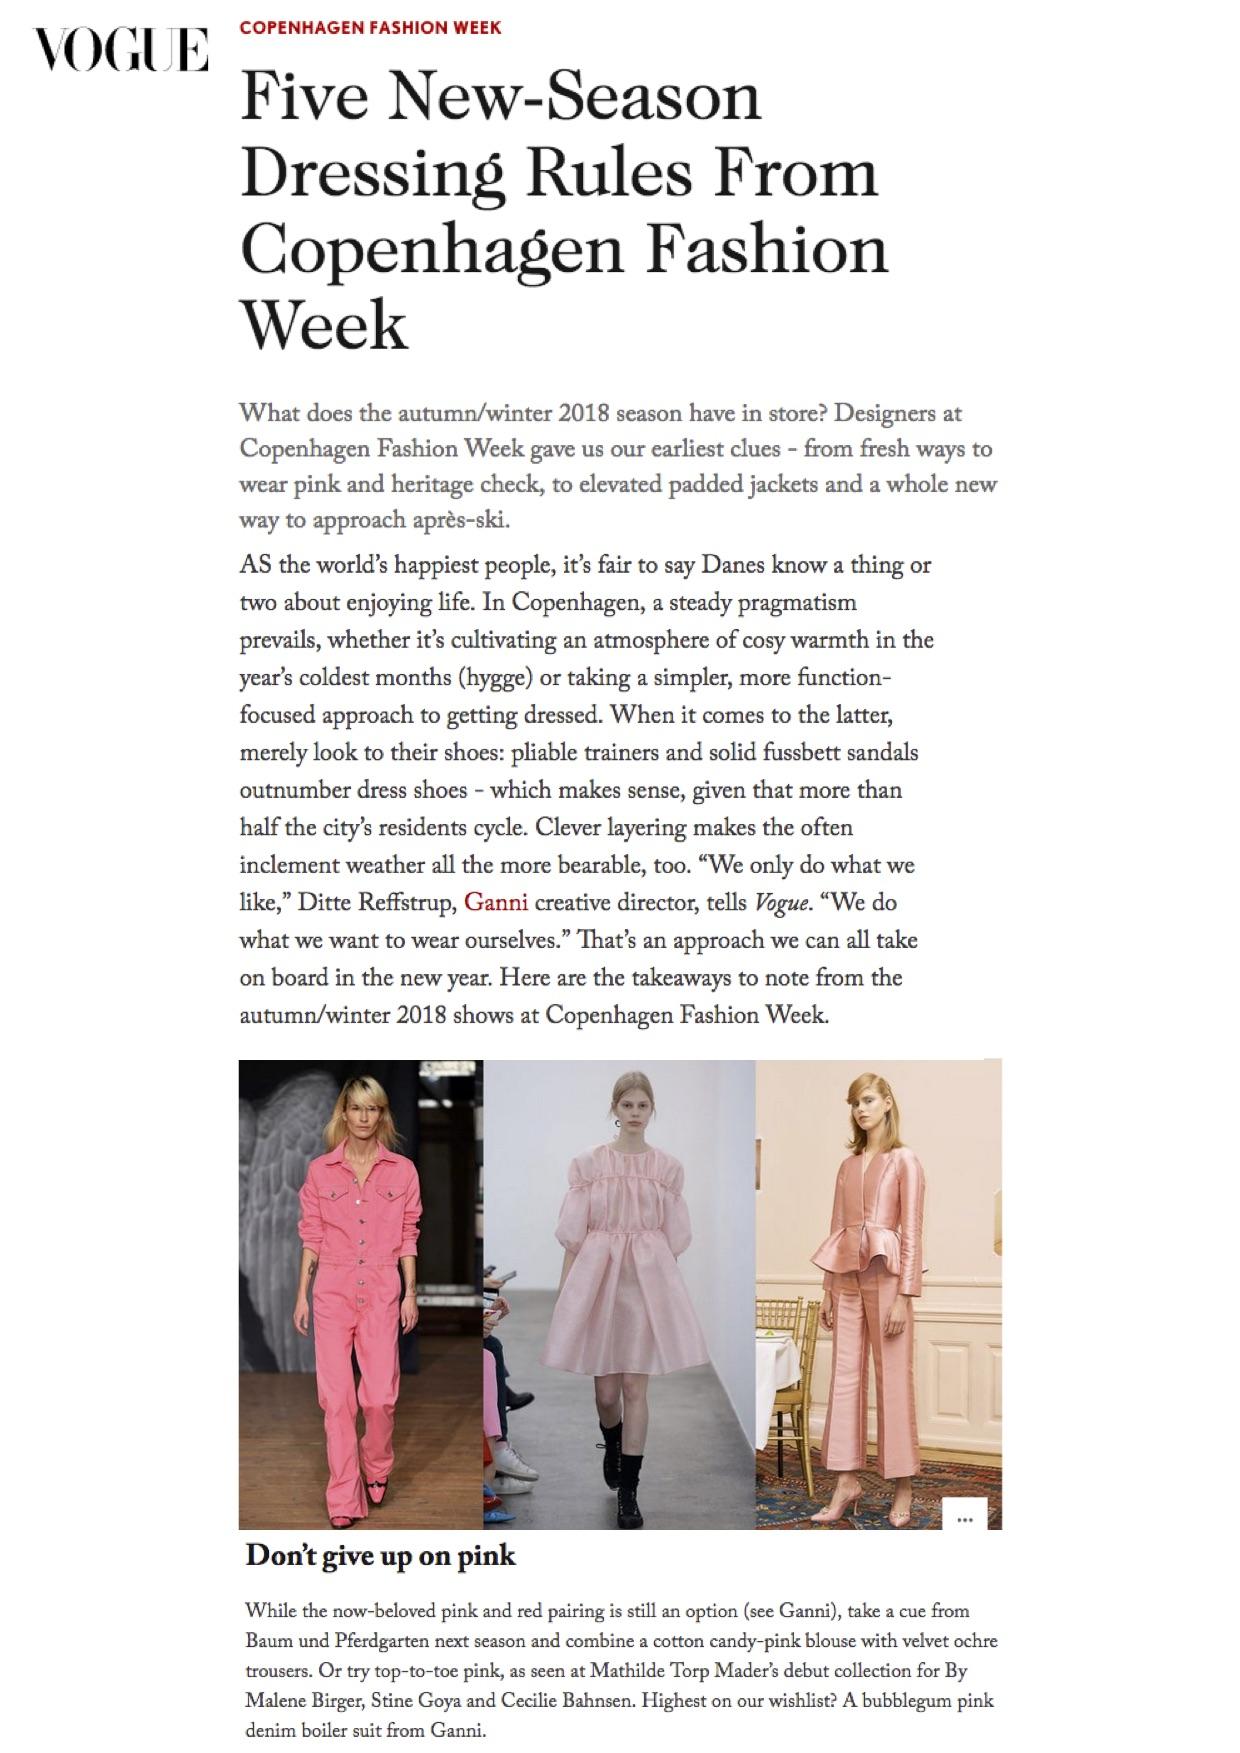 05.02.18 Vogue Online copy.jpg